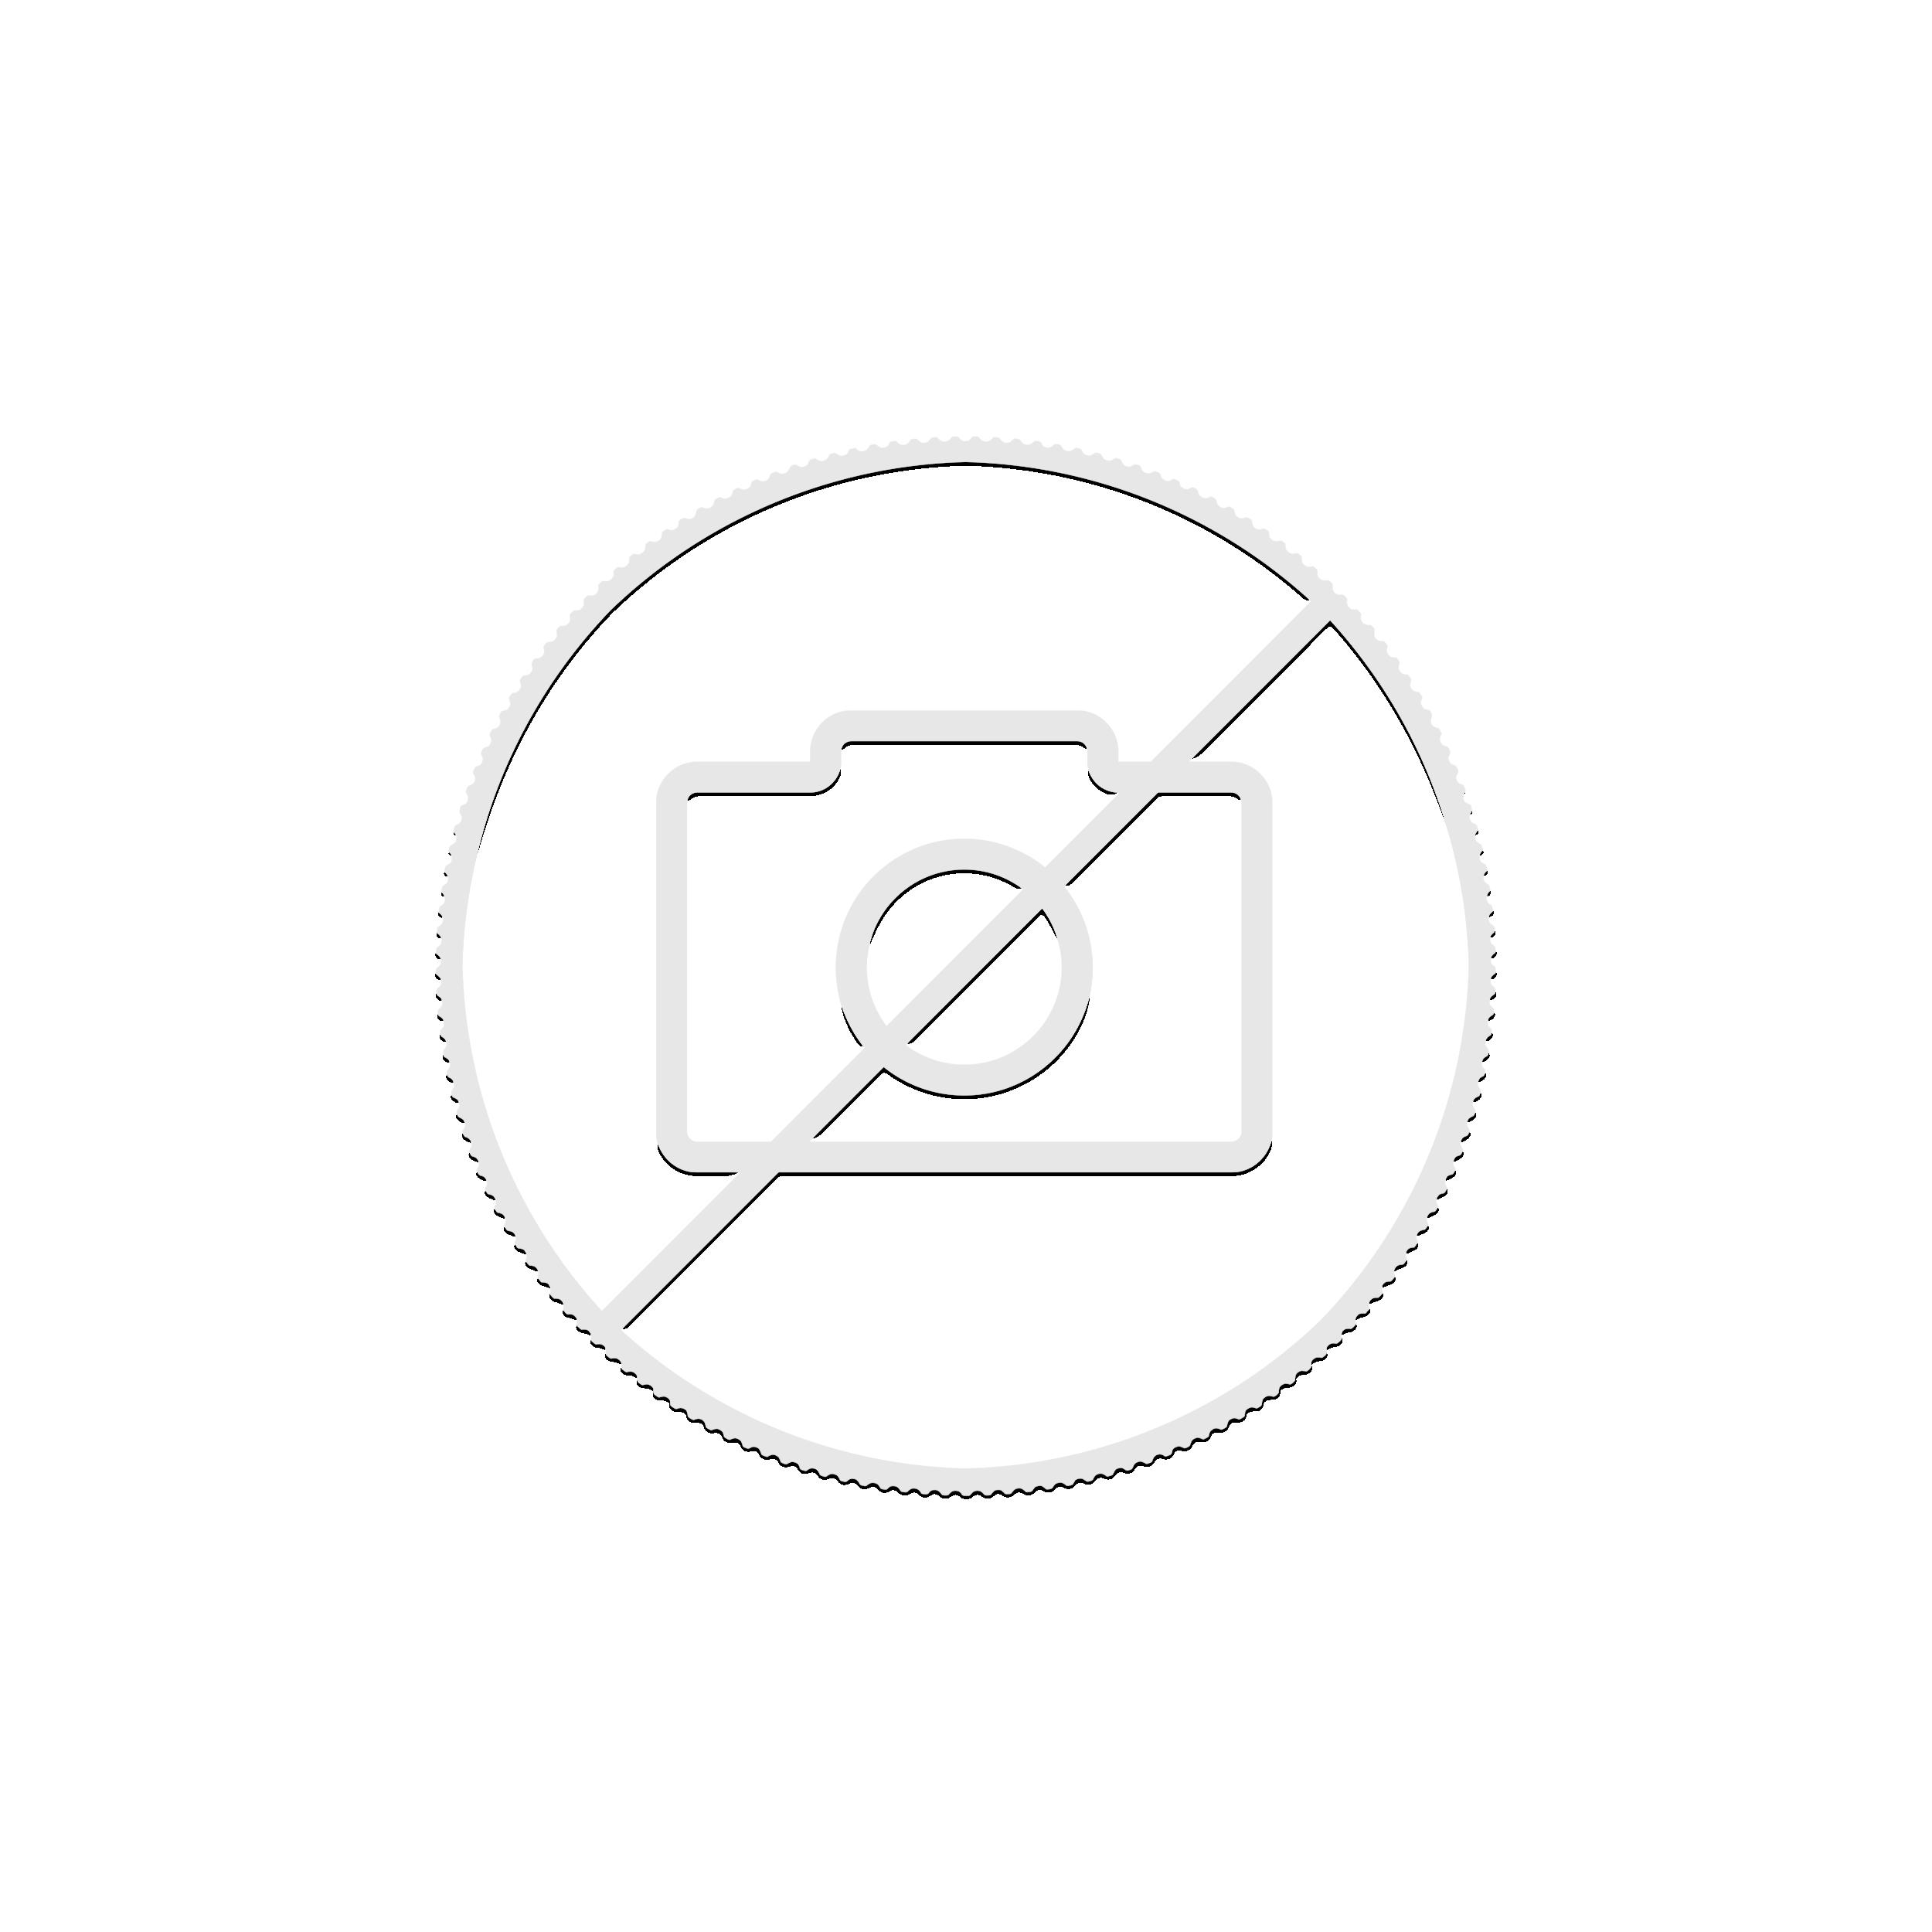 1/10 Troy ounce gold Krugerrand coin 2019